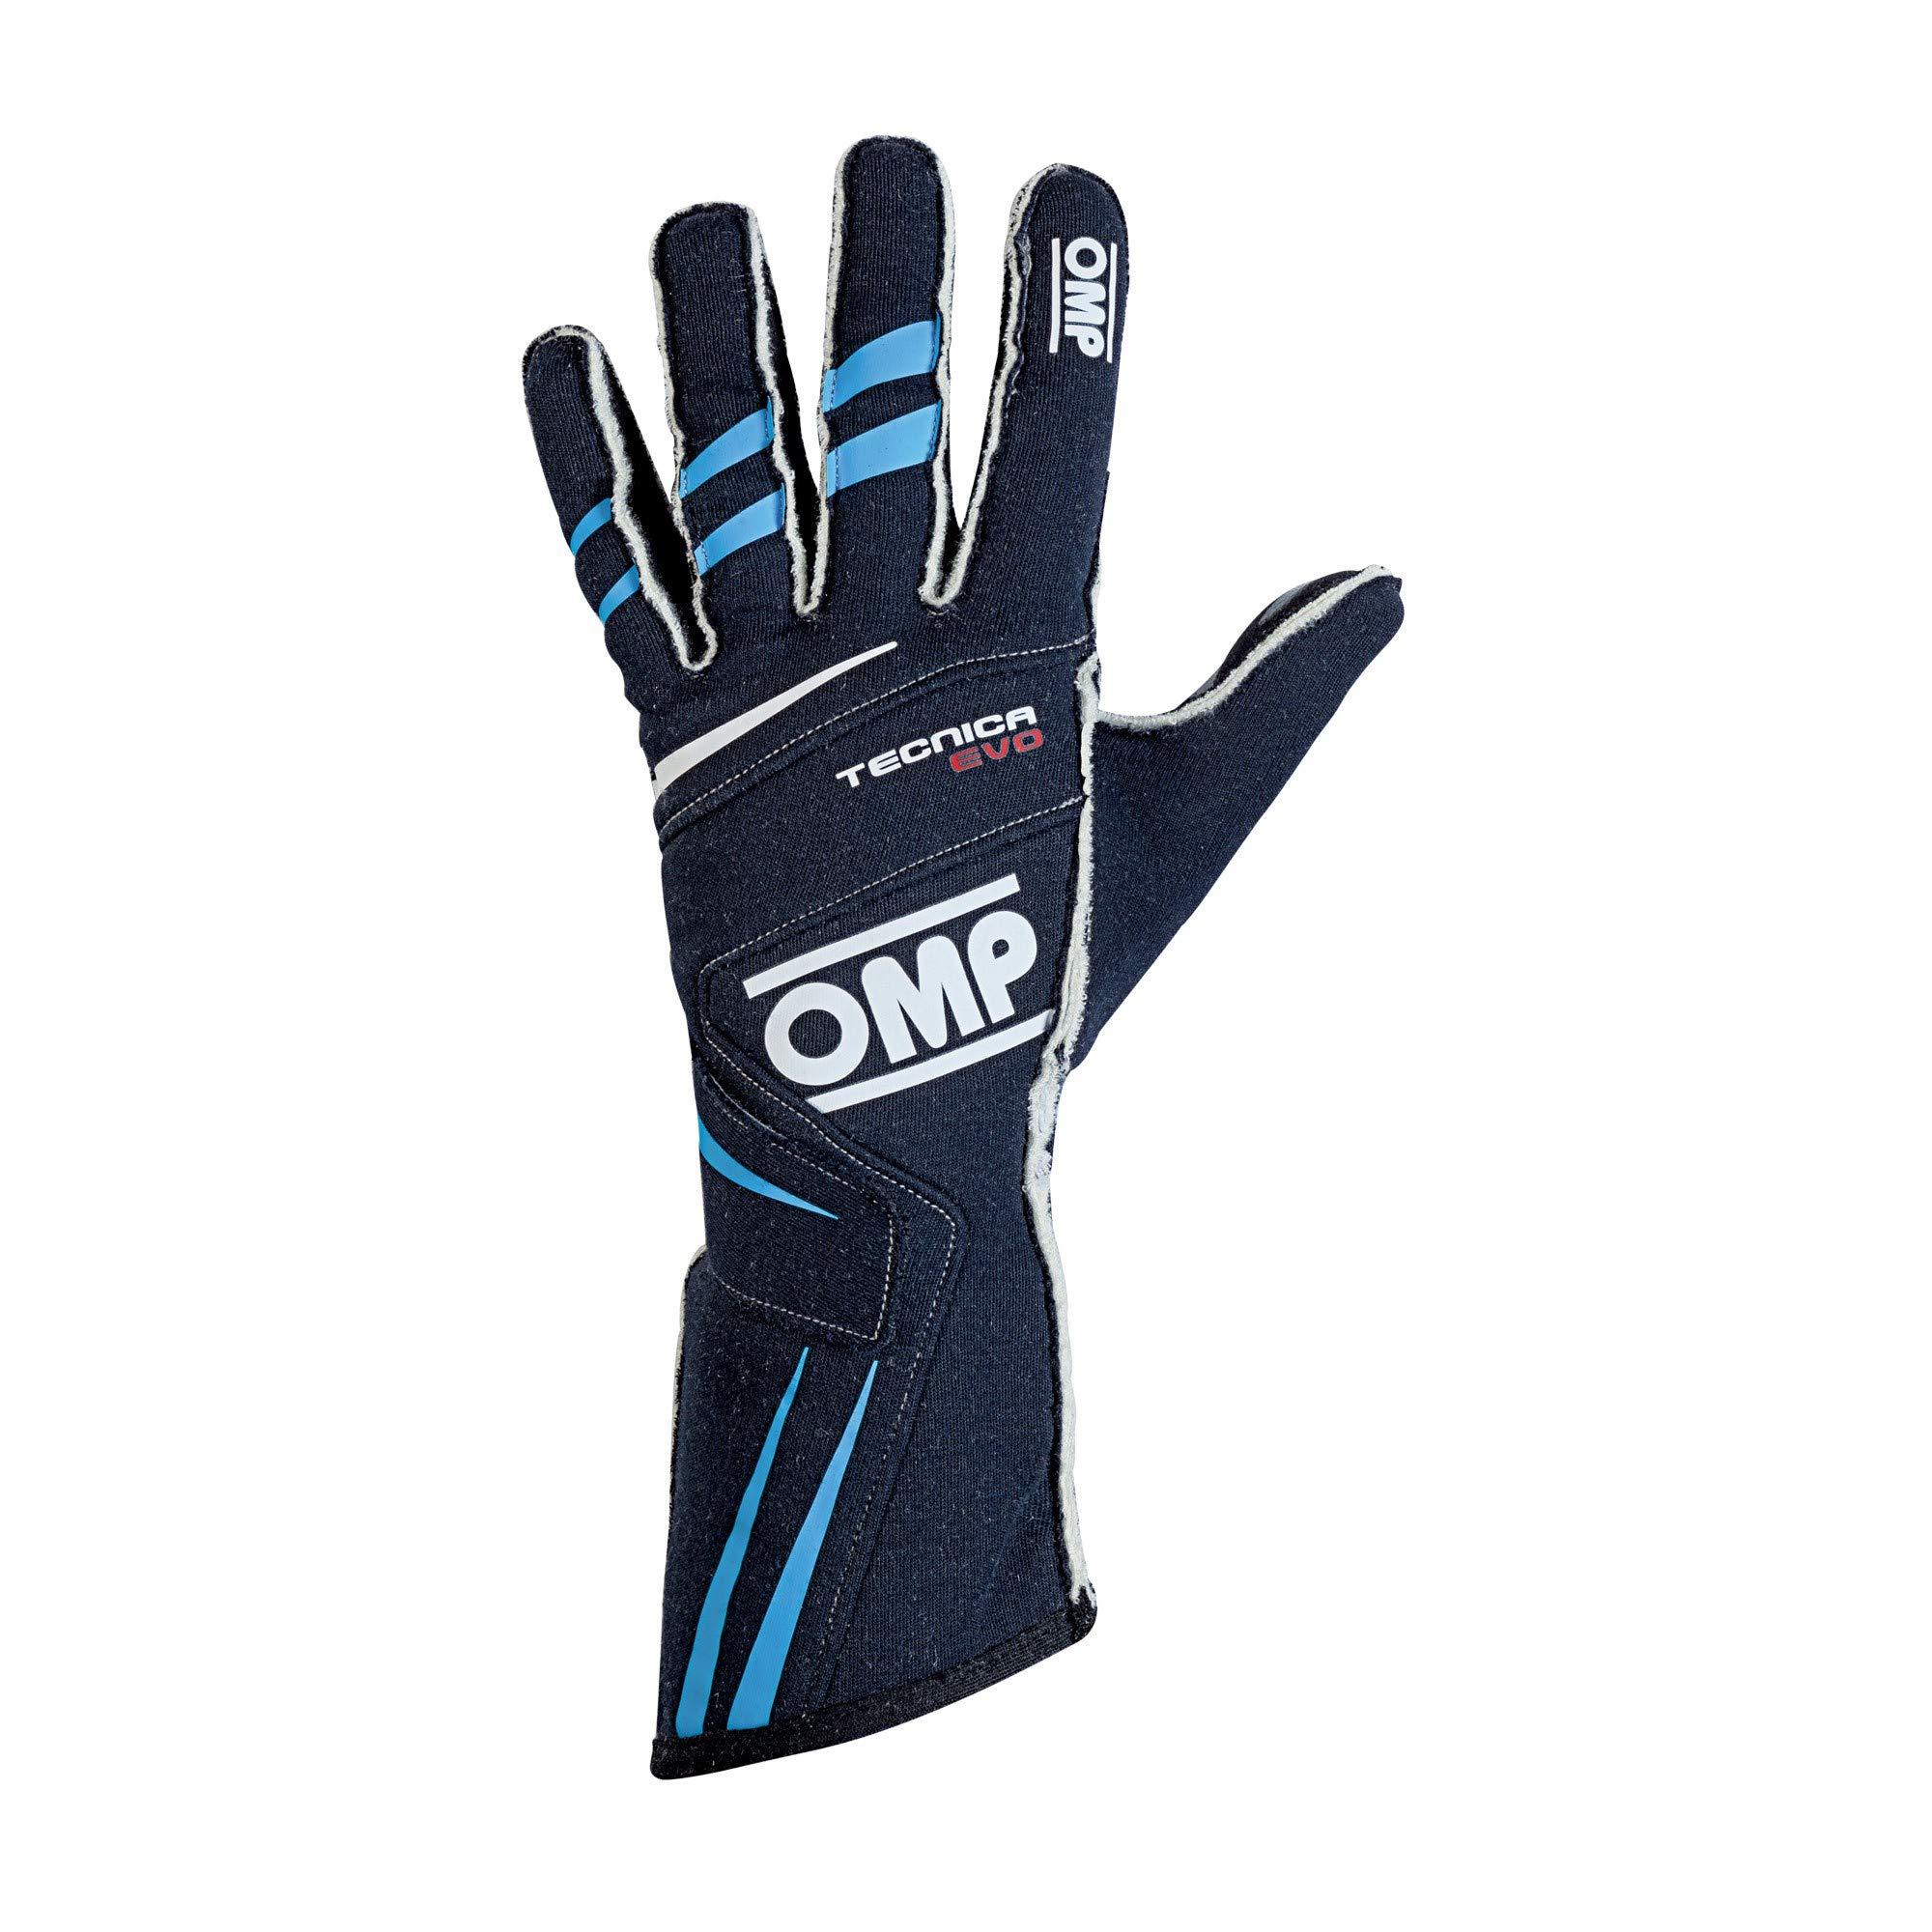 OMP Tecnica Evo Racing Gloves (Size Large, Navy/Cyan)